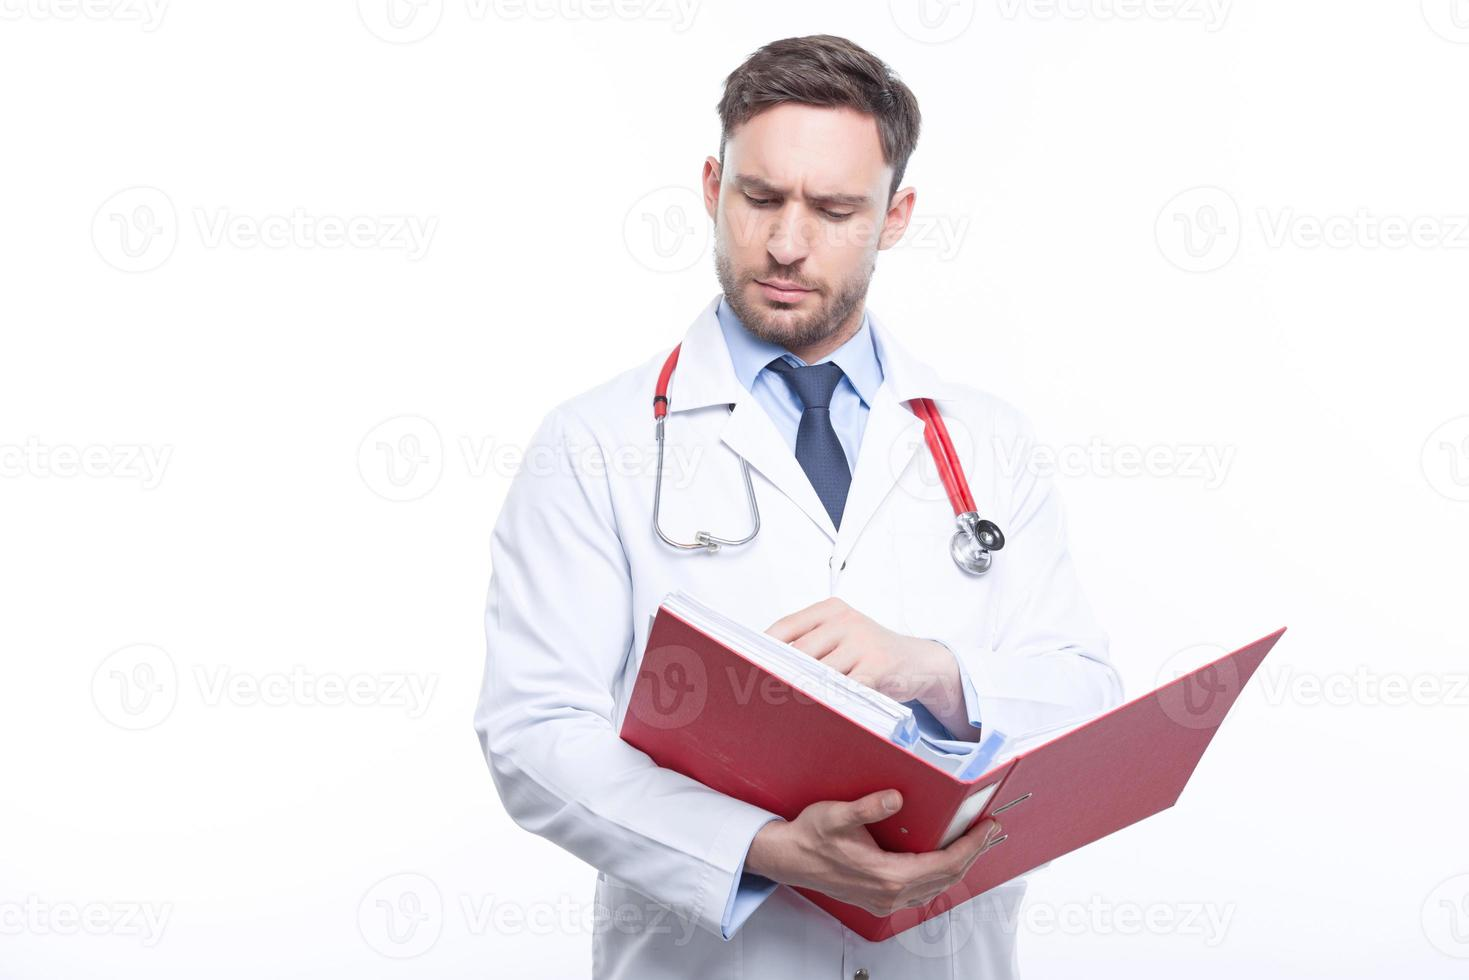 médico pensativo, segurando a pasta foto